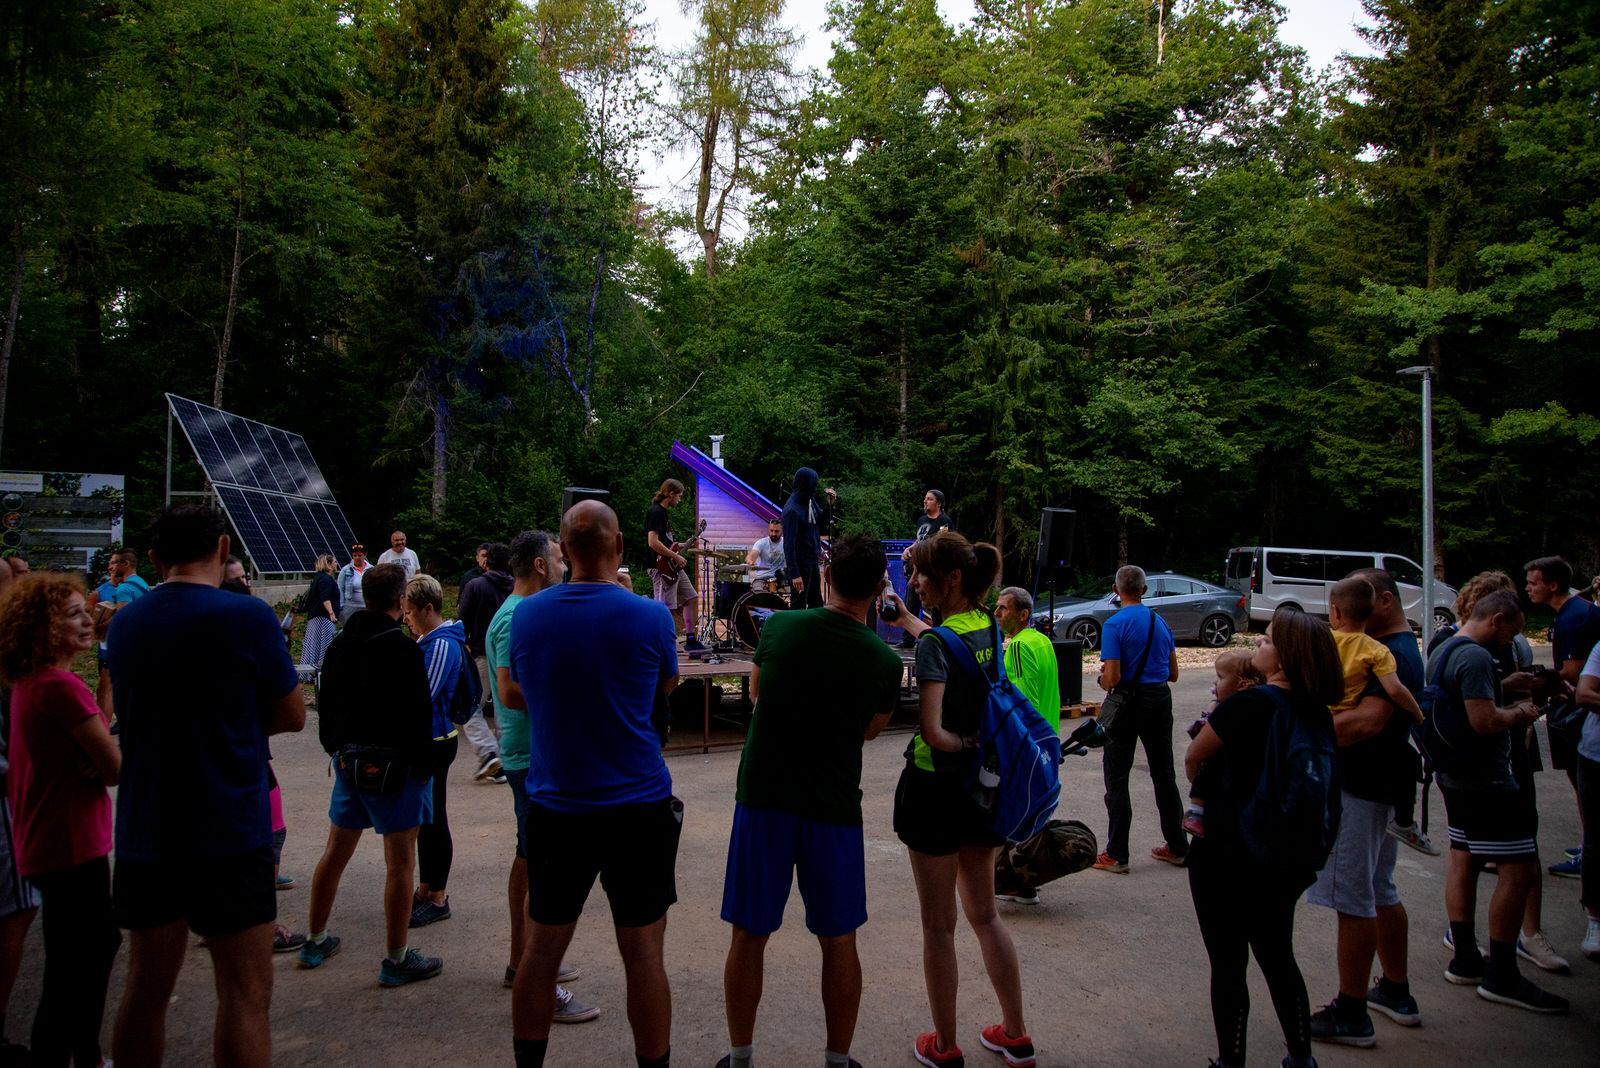 likaclub_lika night run_jasikovac_7_2020 (25)